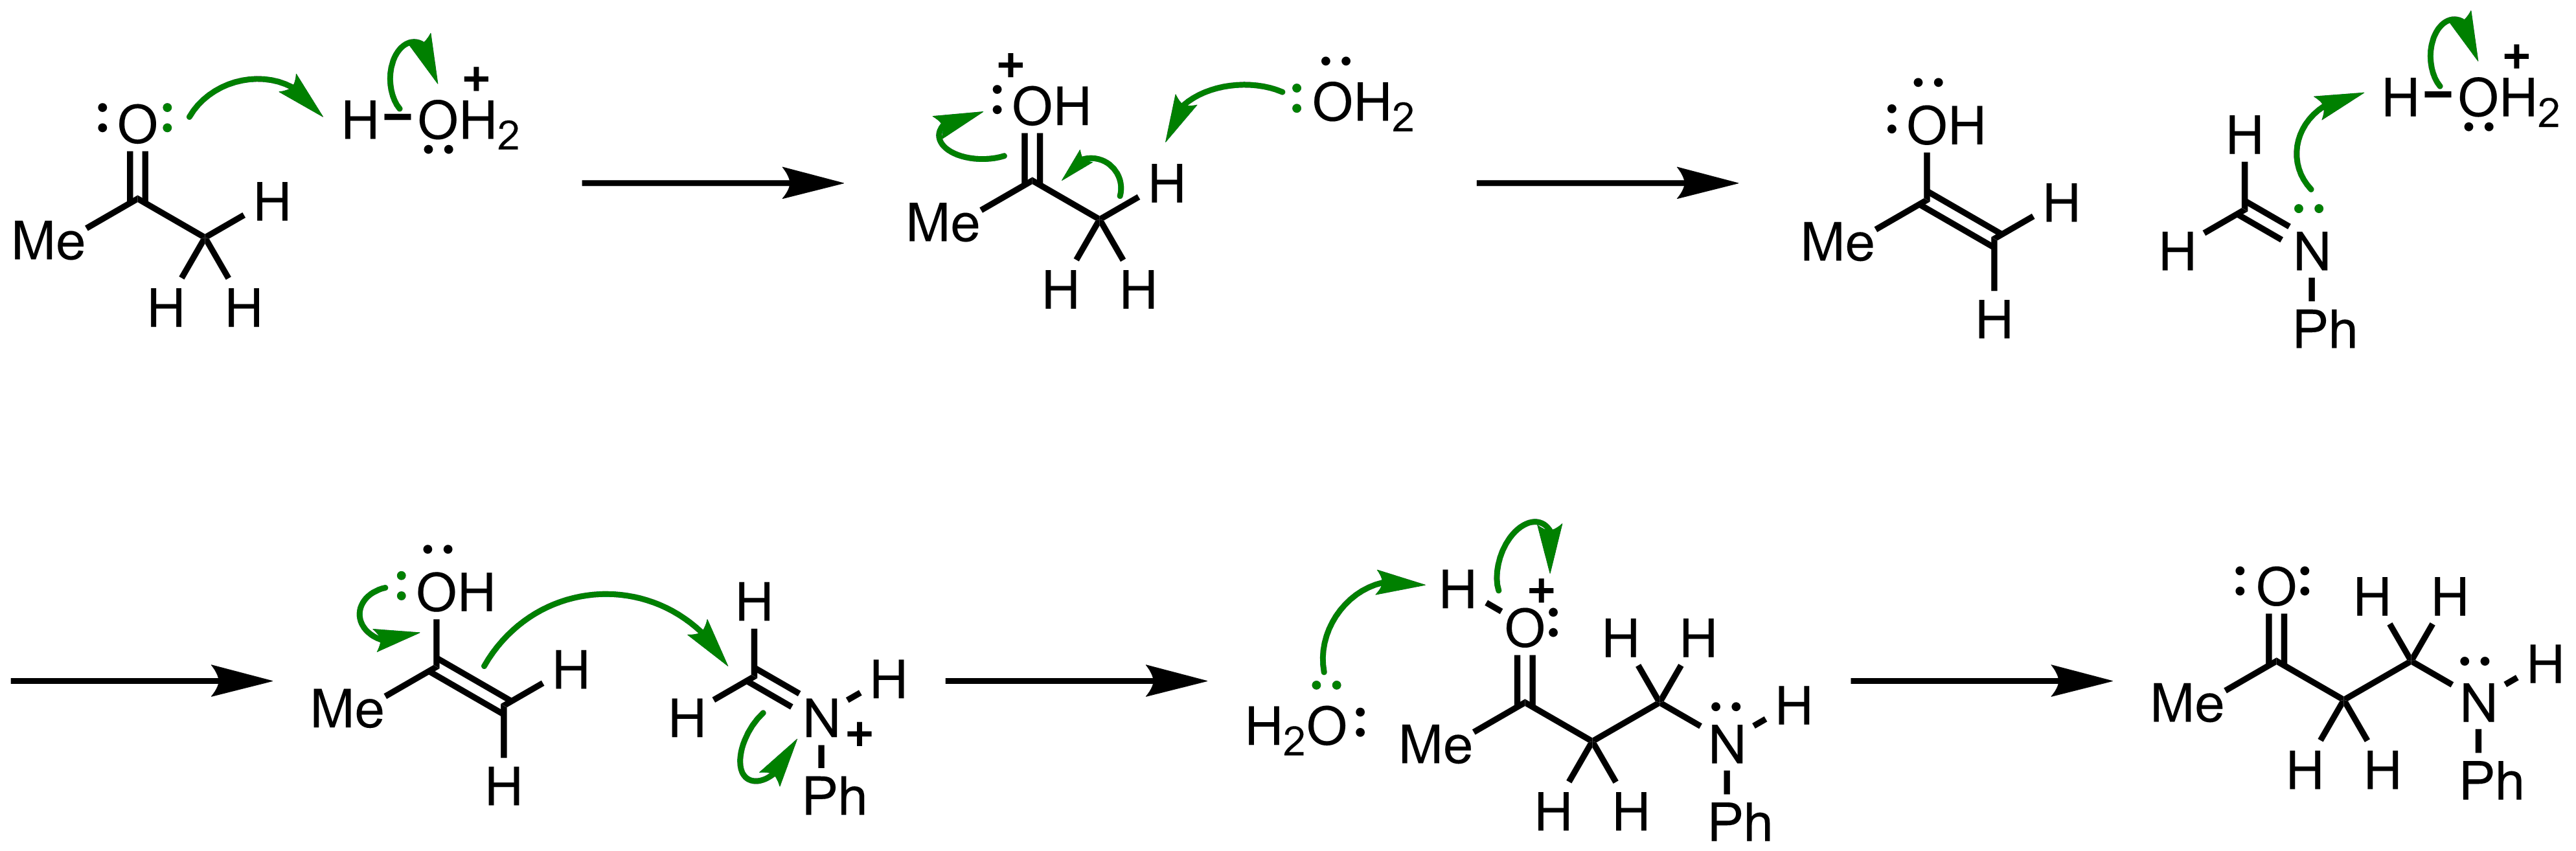 Mechanism of the Mannich Reaction